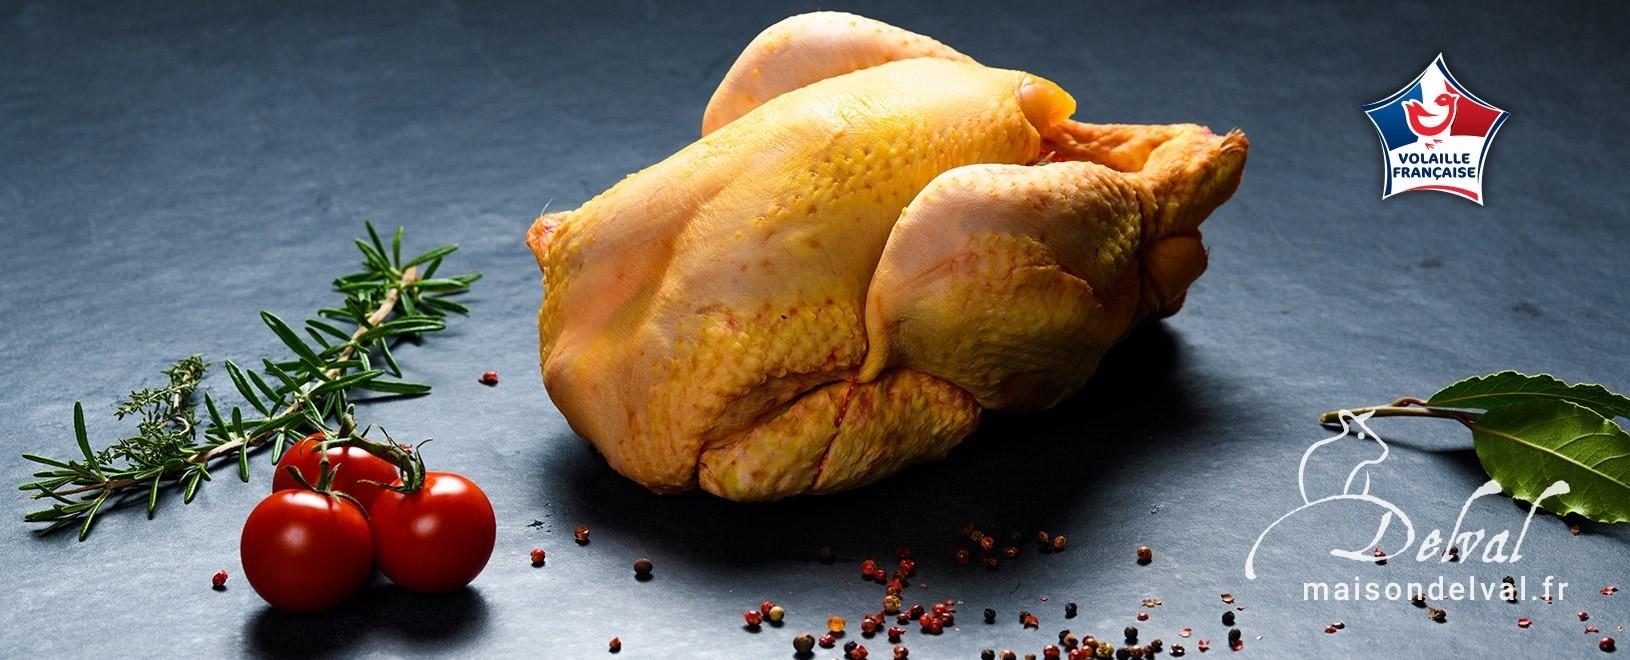 Viande de poulet - Vente en ligne